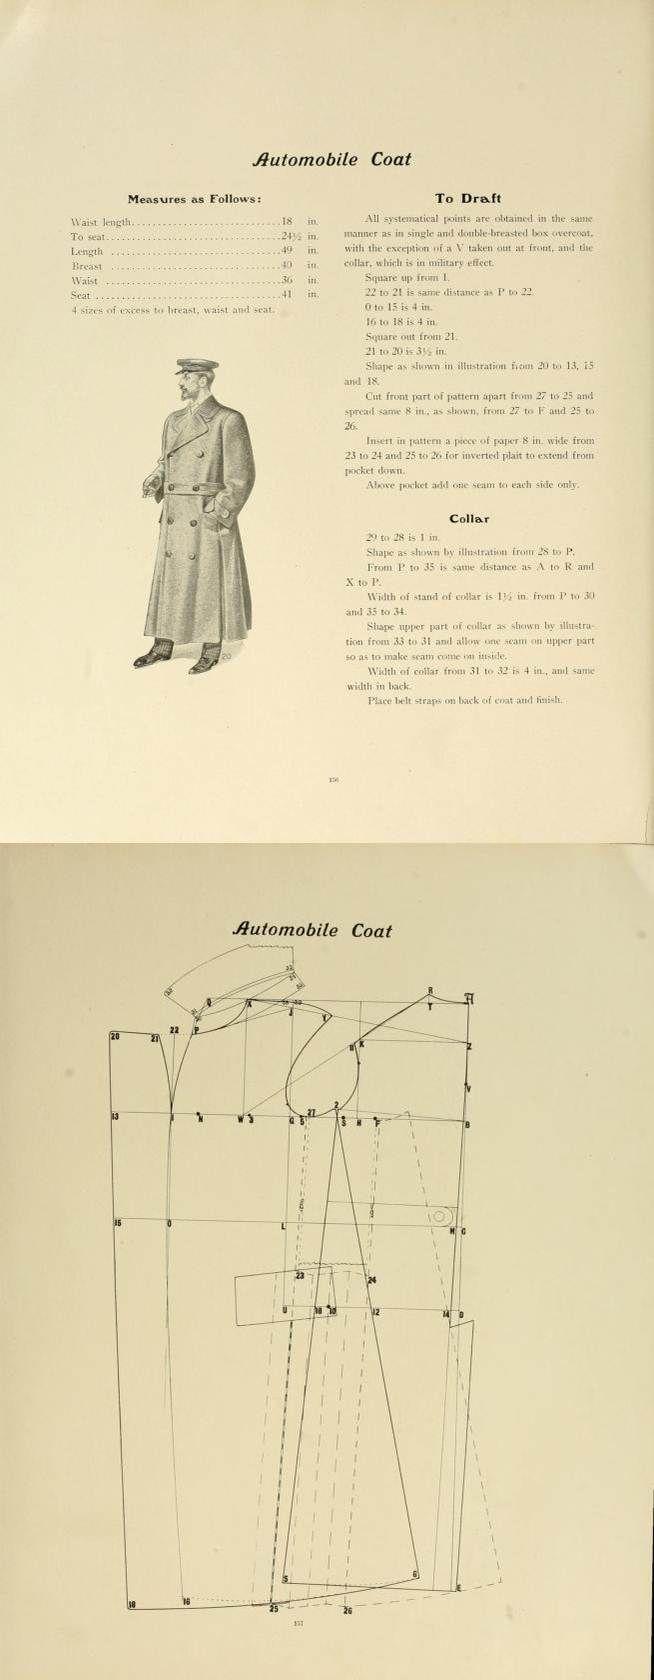 1907 men's automobile coat